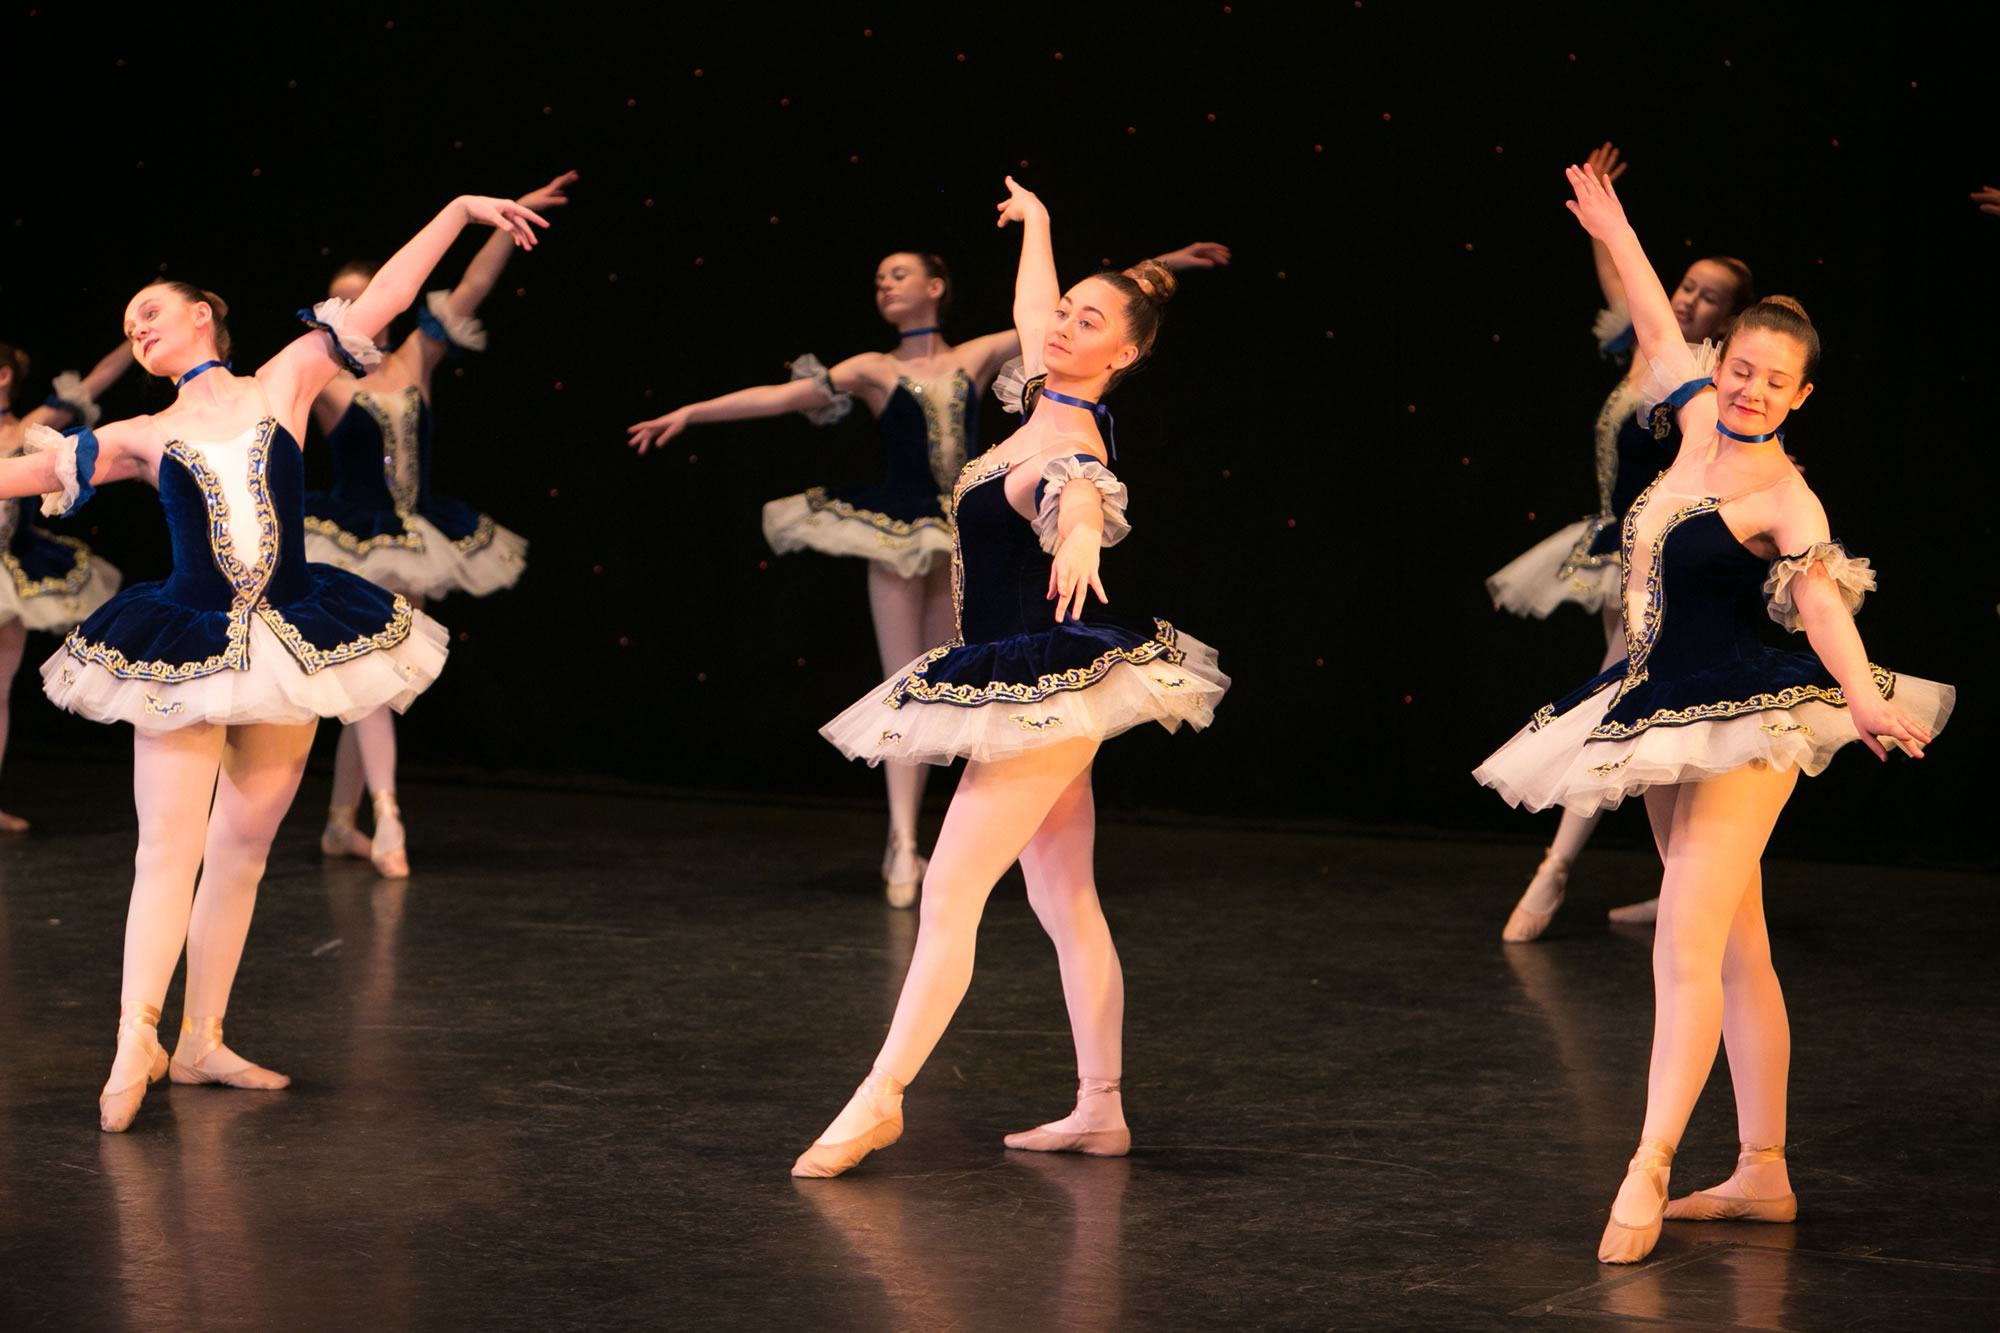 Hitchin_School_of_Dance_Show_2019-SM1_2816.jpg